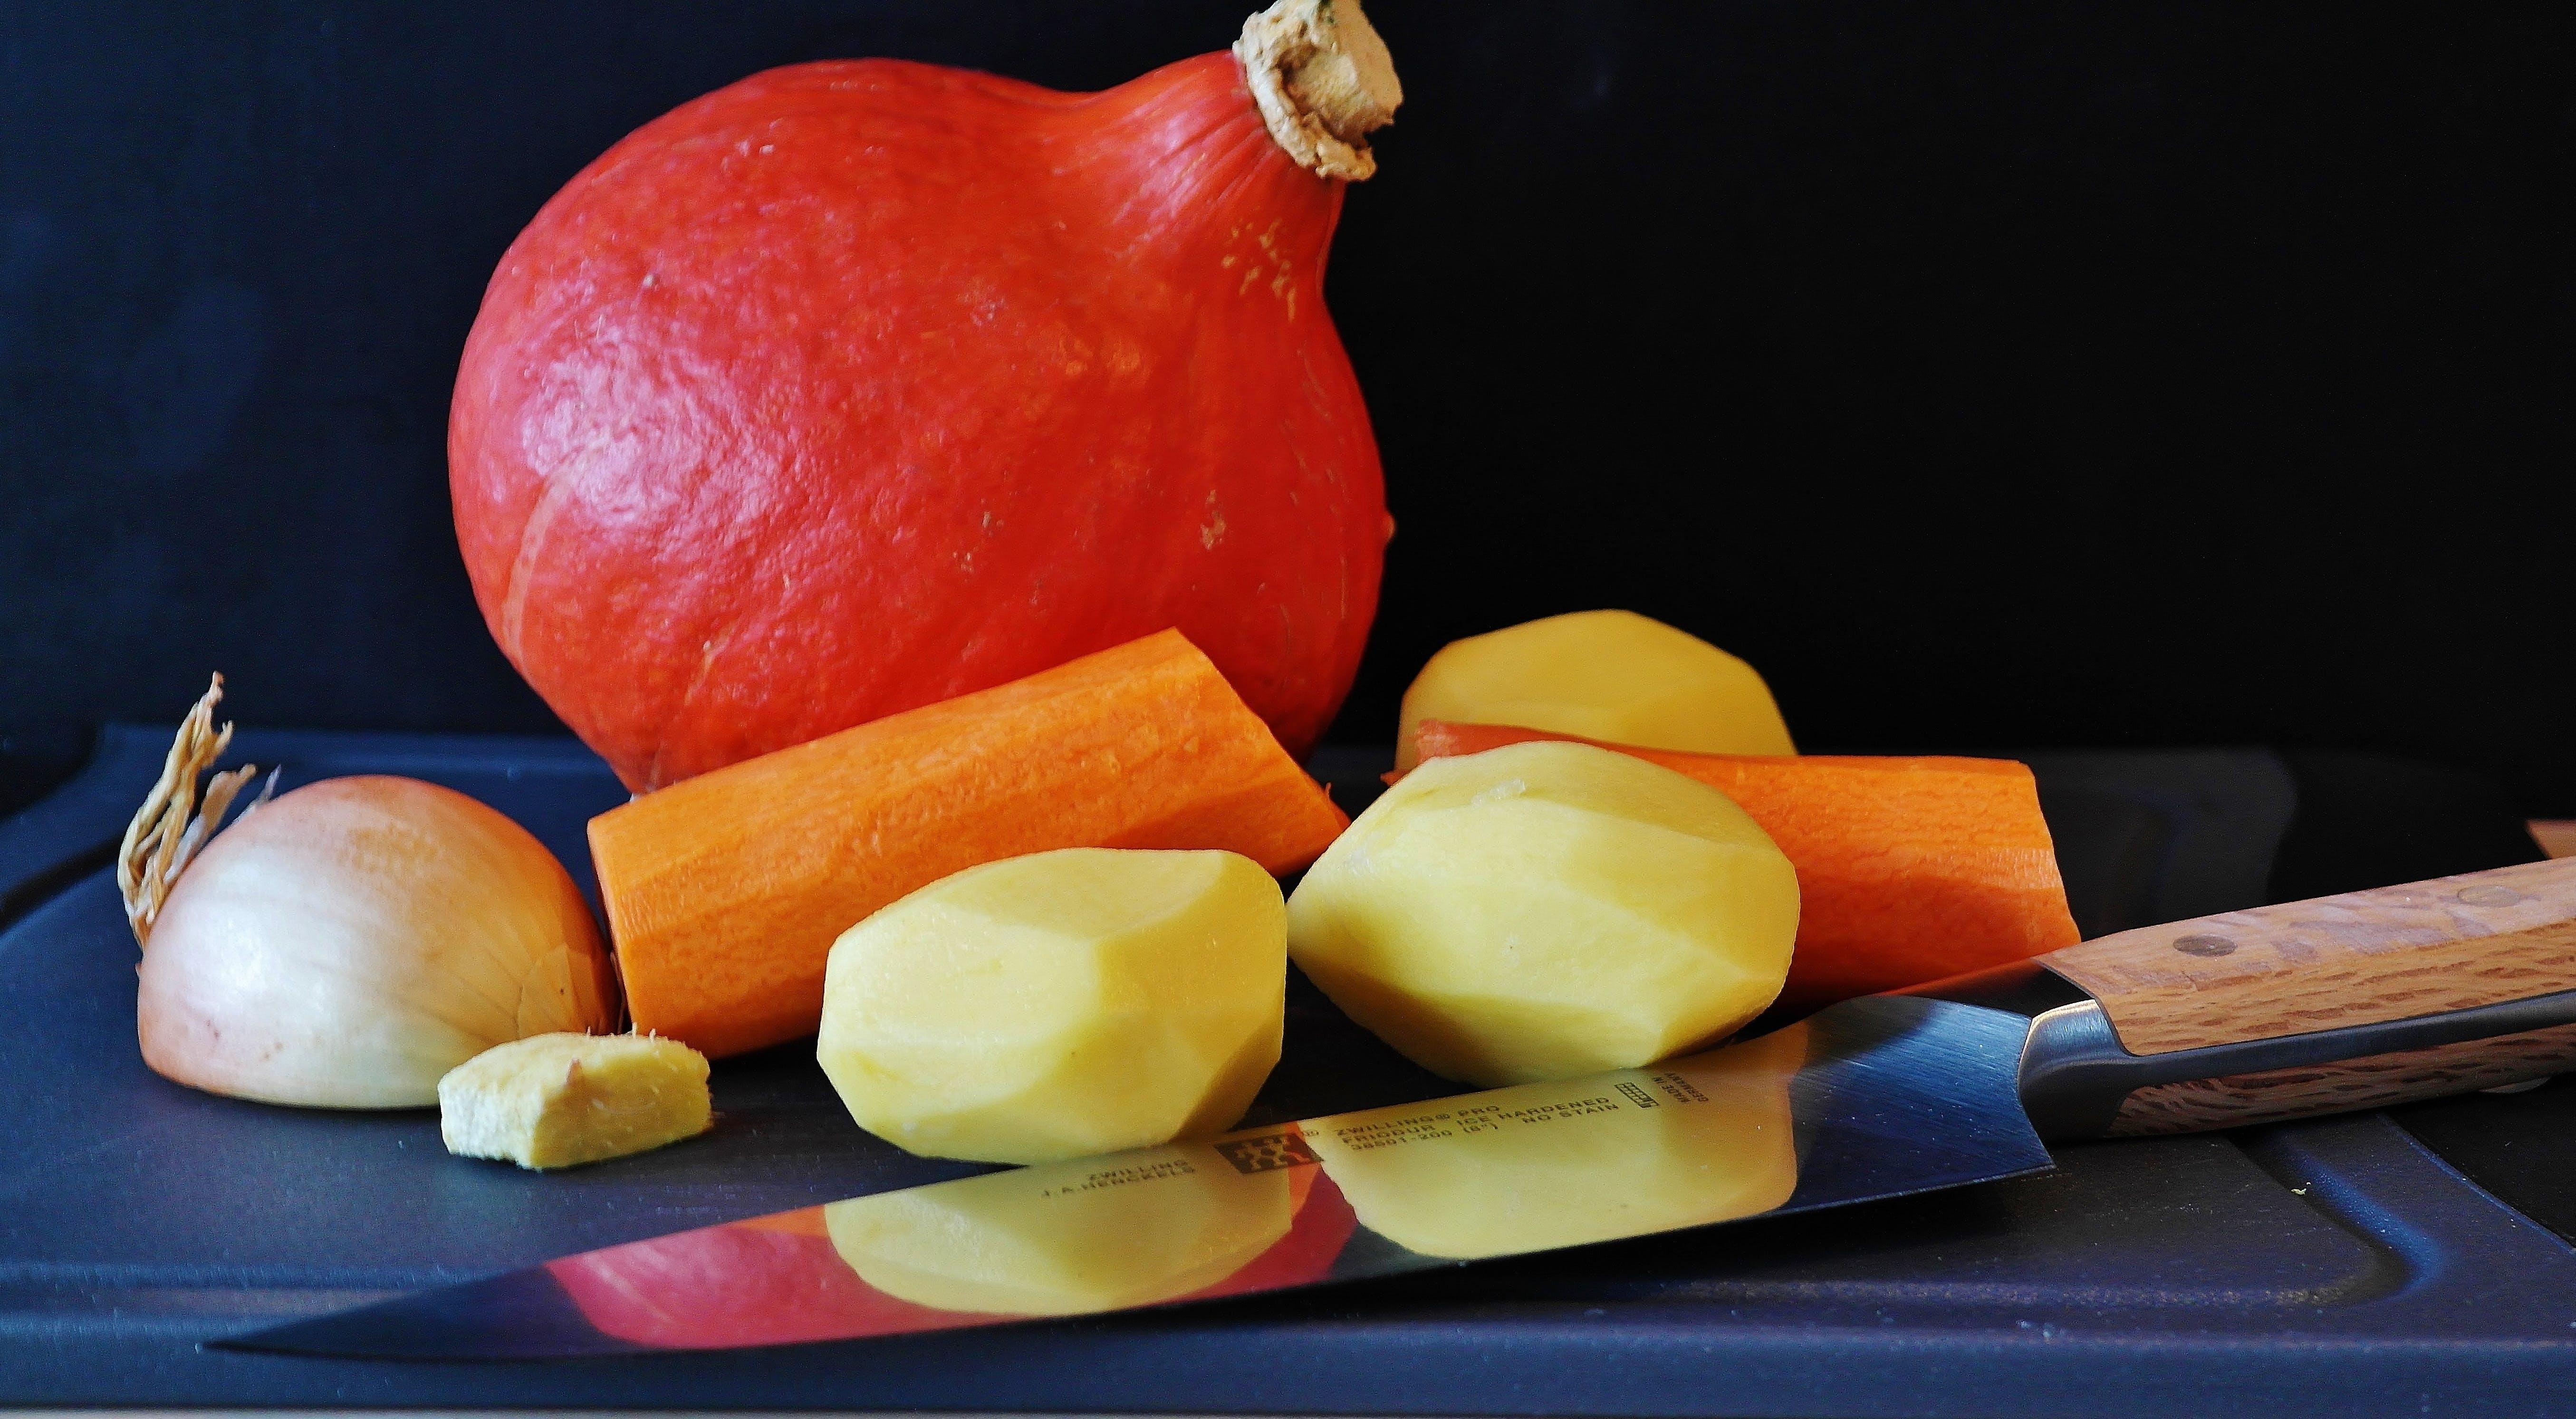 Kitchen Knife With Peeled Sweet Potato and Sliced Garkuc